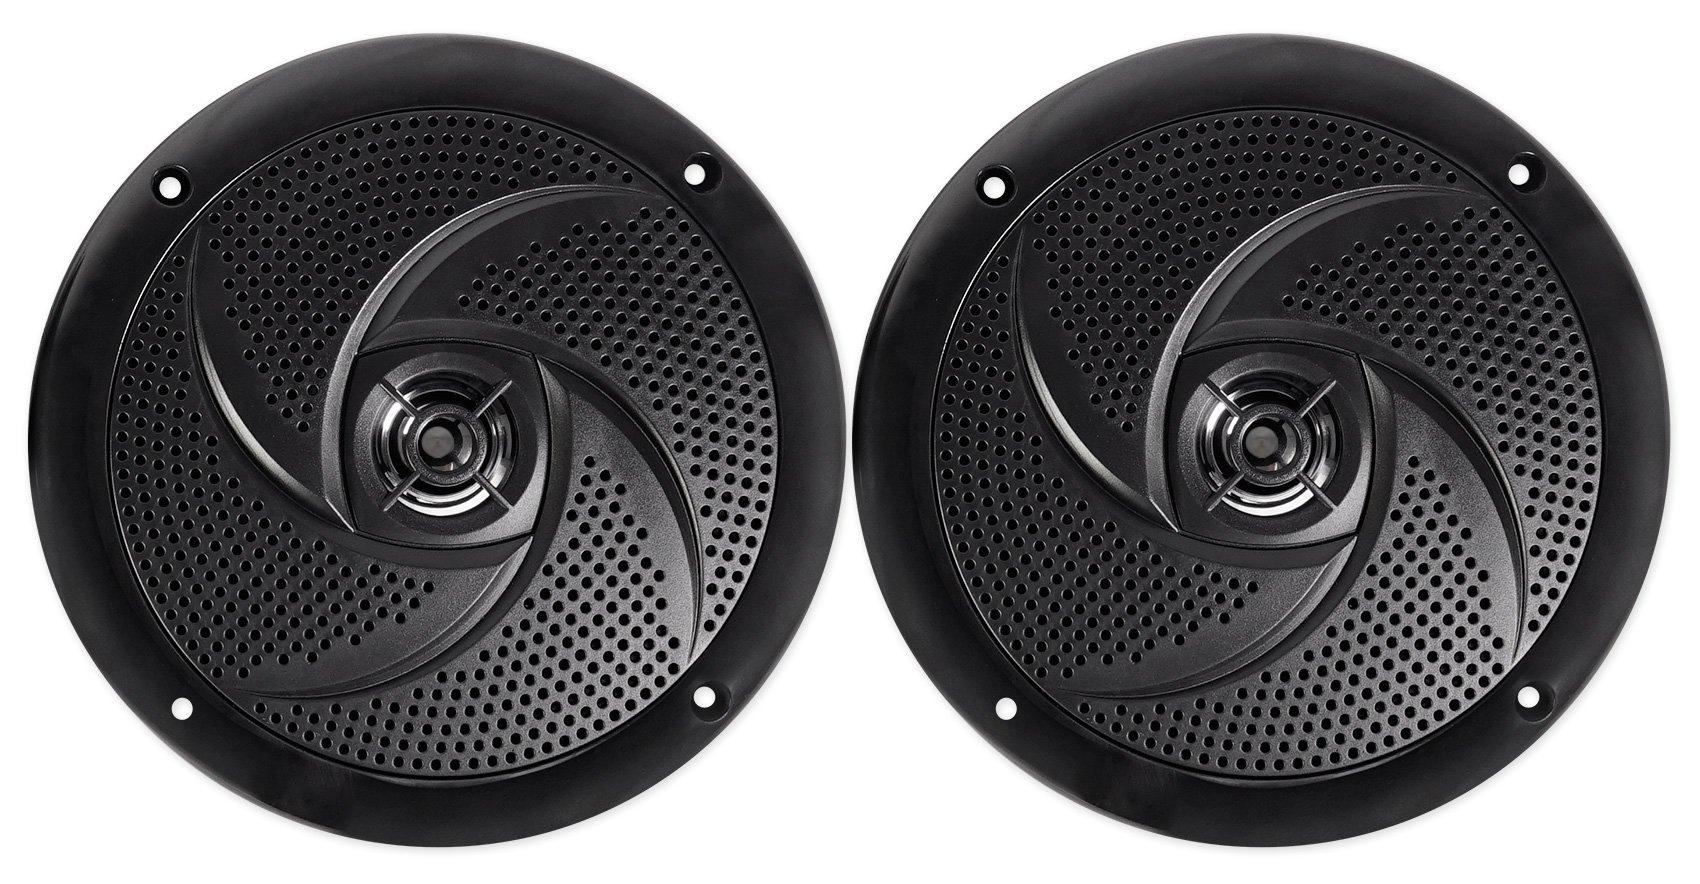 2 Rockville RSM65B 6.5'' 320w Waterproof Shallow Slim Speakers 4 RZR/ATV/UTV/Cart by Rockville (Image #2)